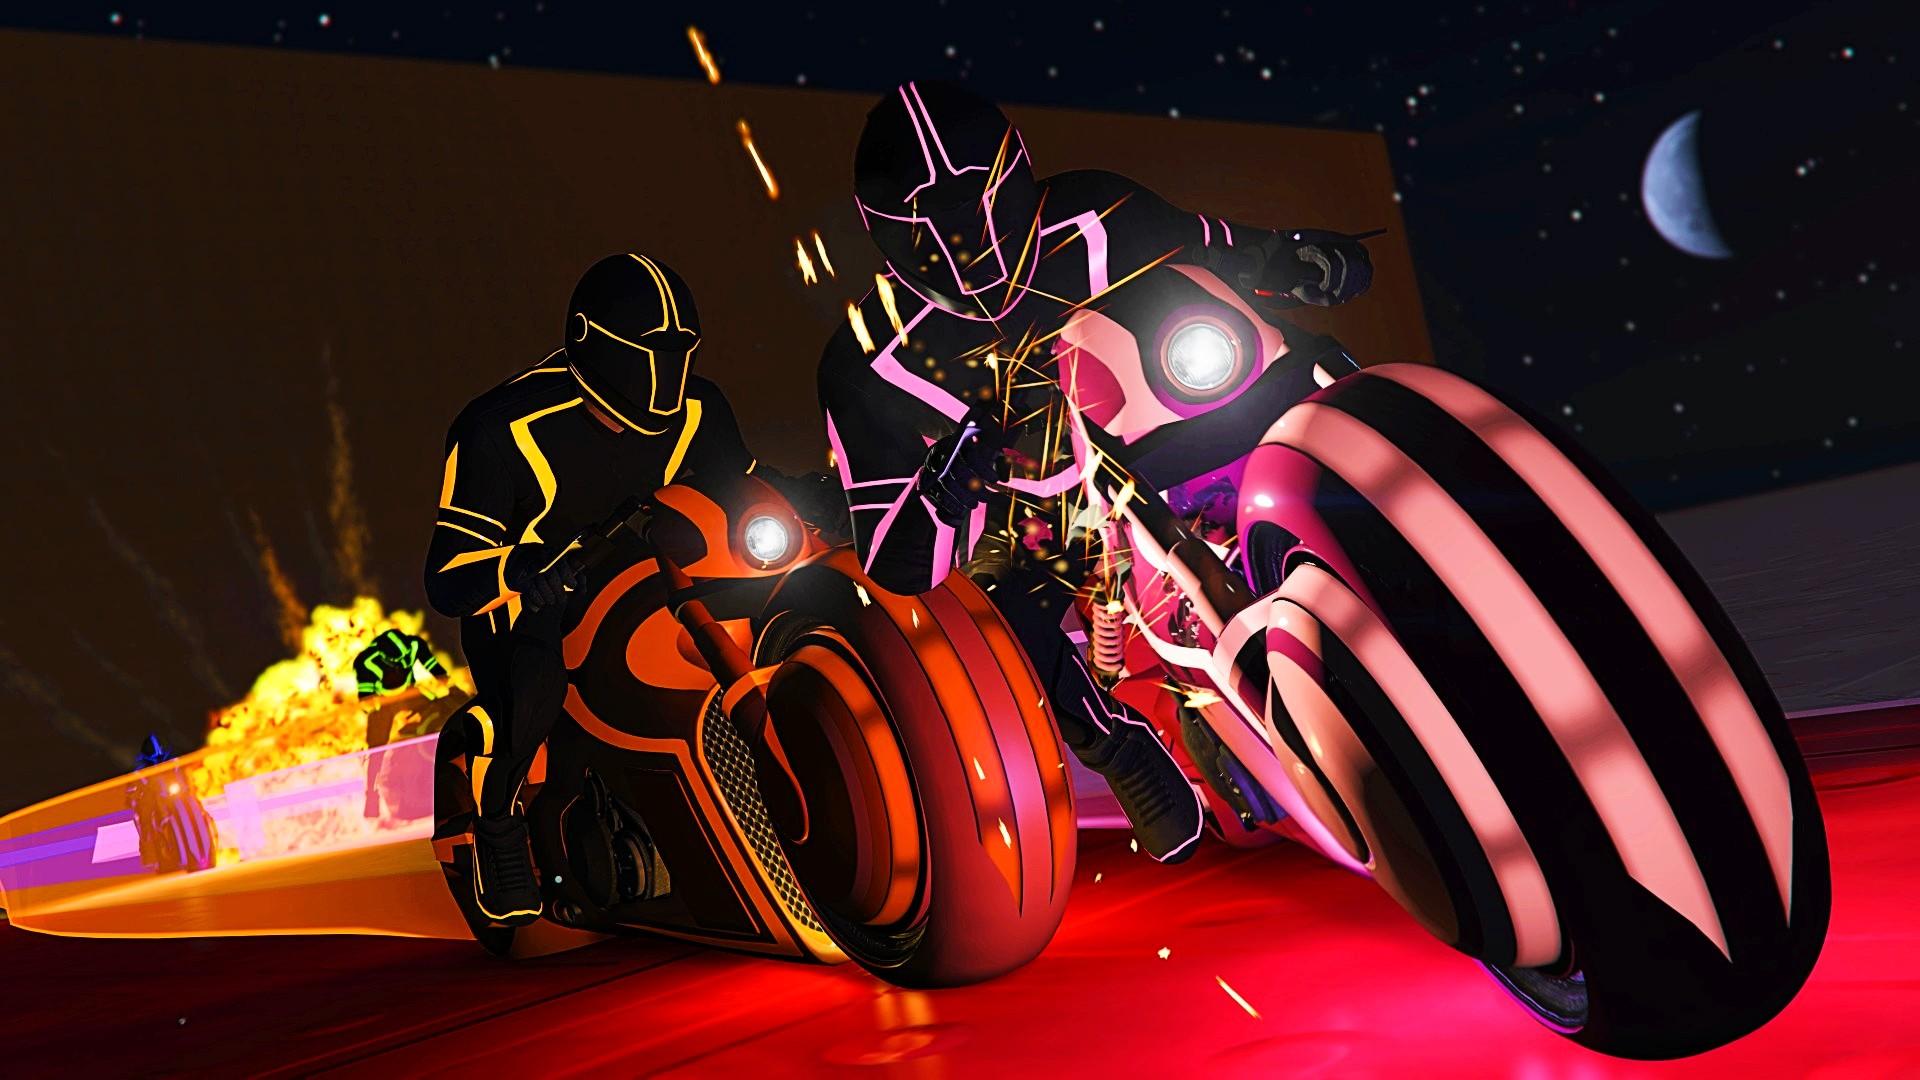 GTA Online's weekly update boosts rewards on Deadline, Biker Sell missions -